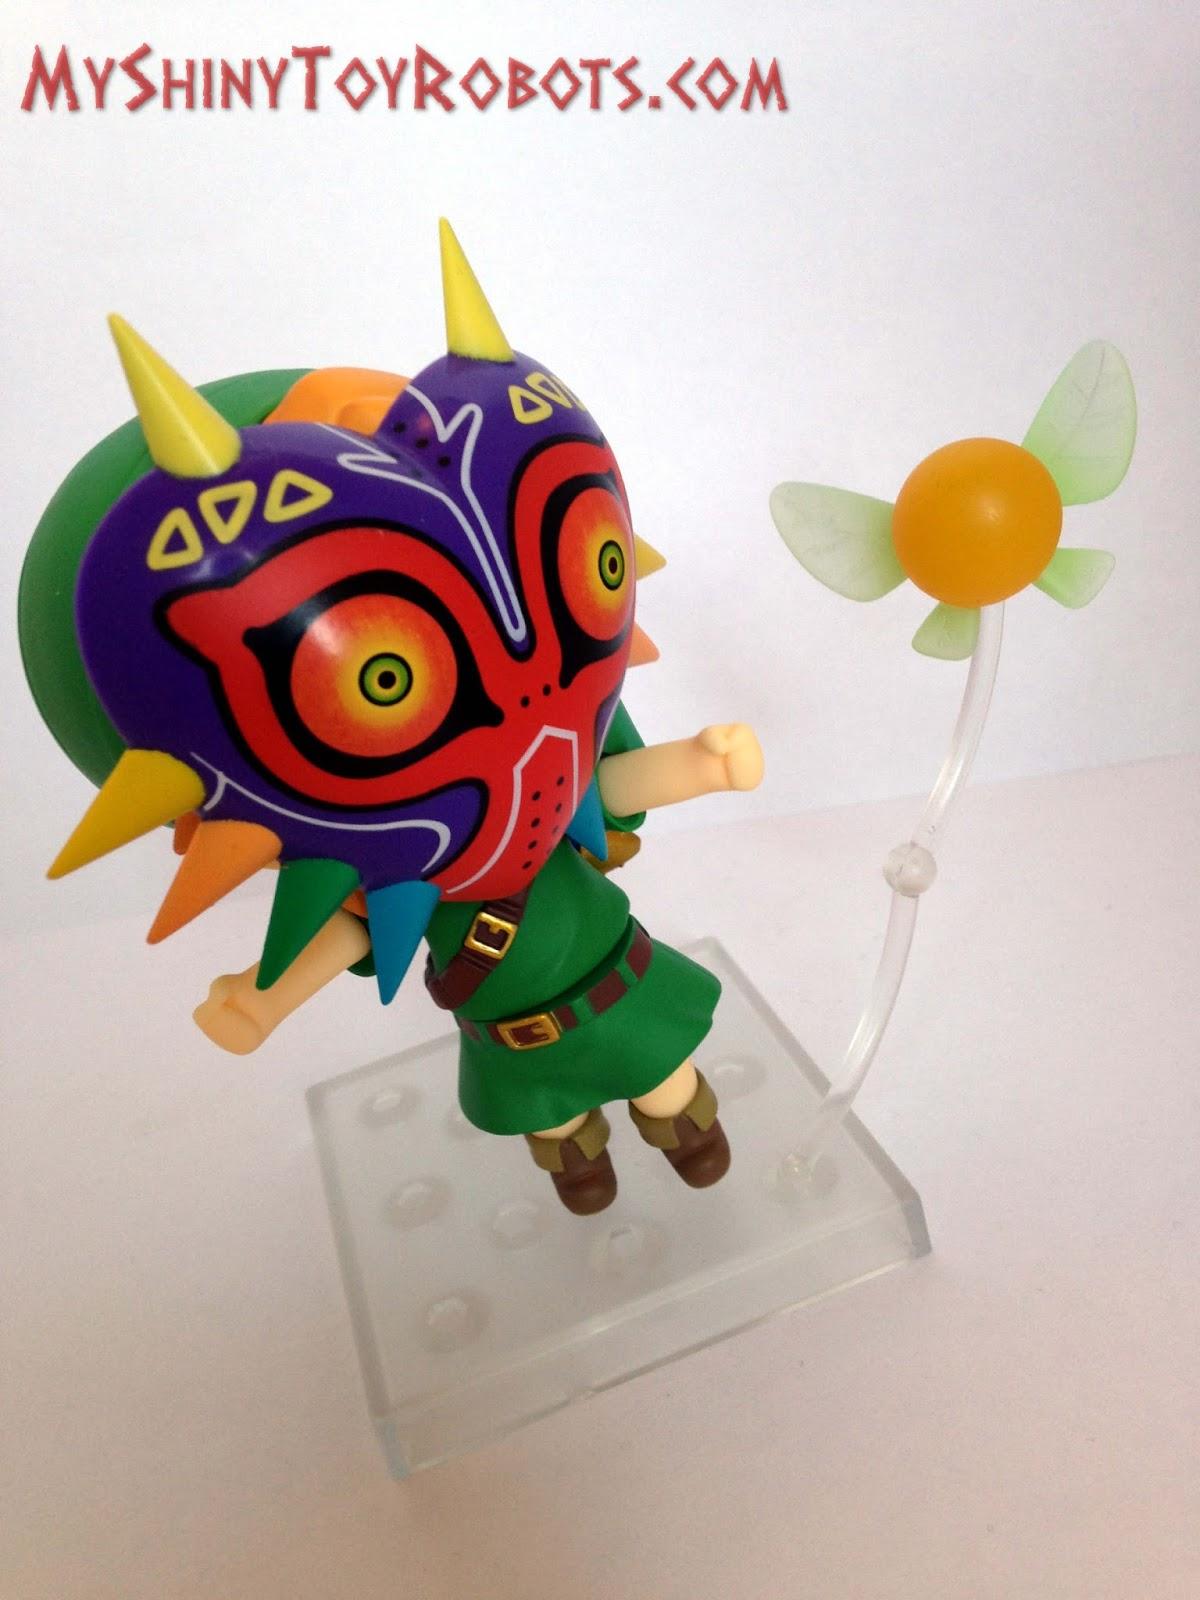 My Shiny Toy Robots: Toybox REVIEW: Nendoroid Link (Majora's Mask ...